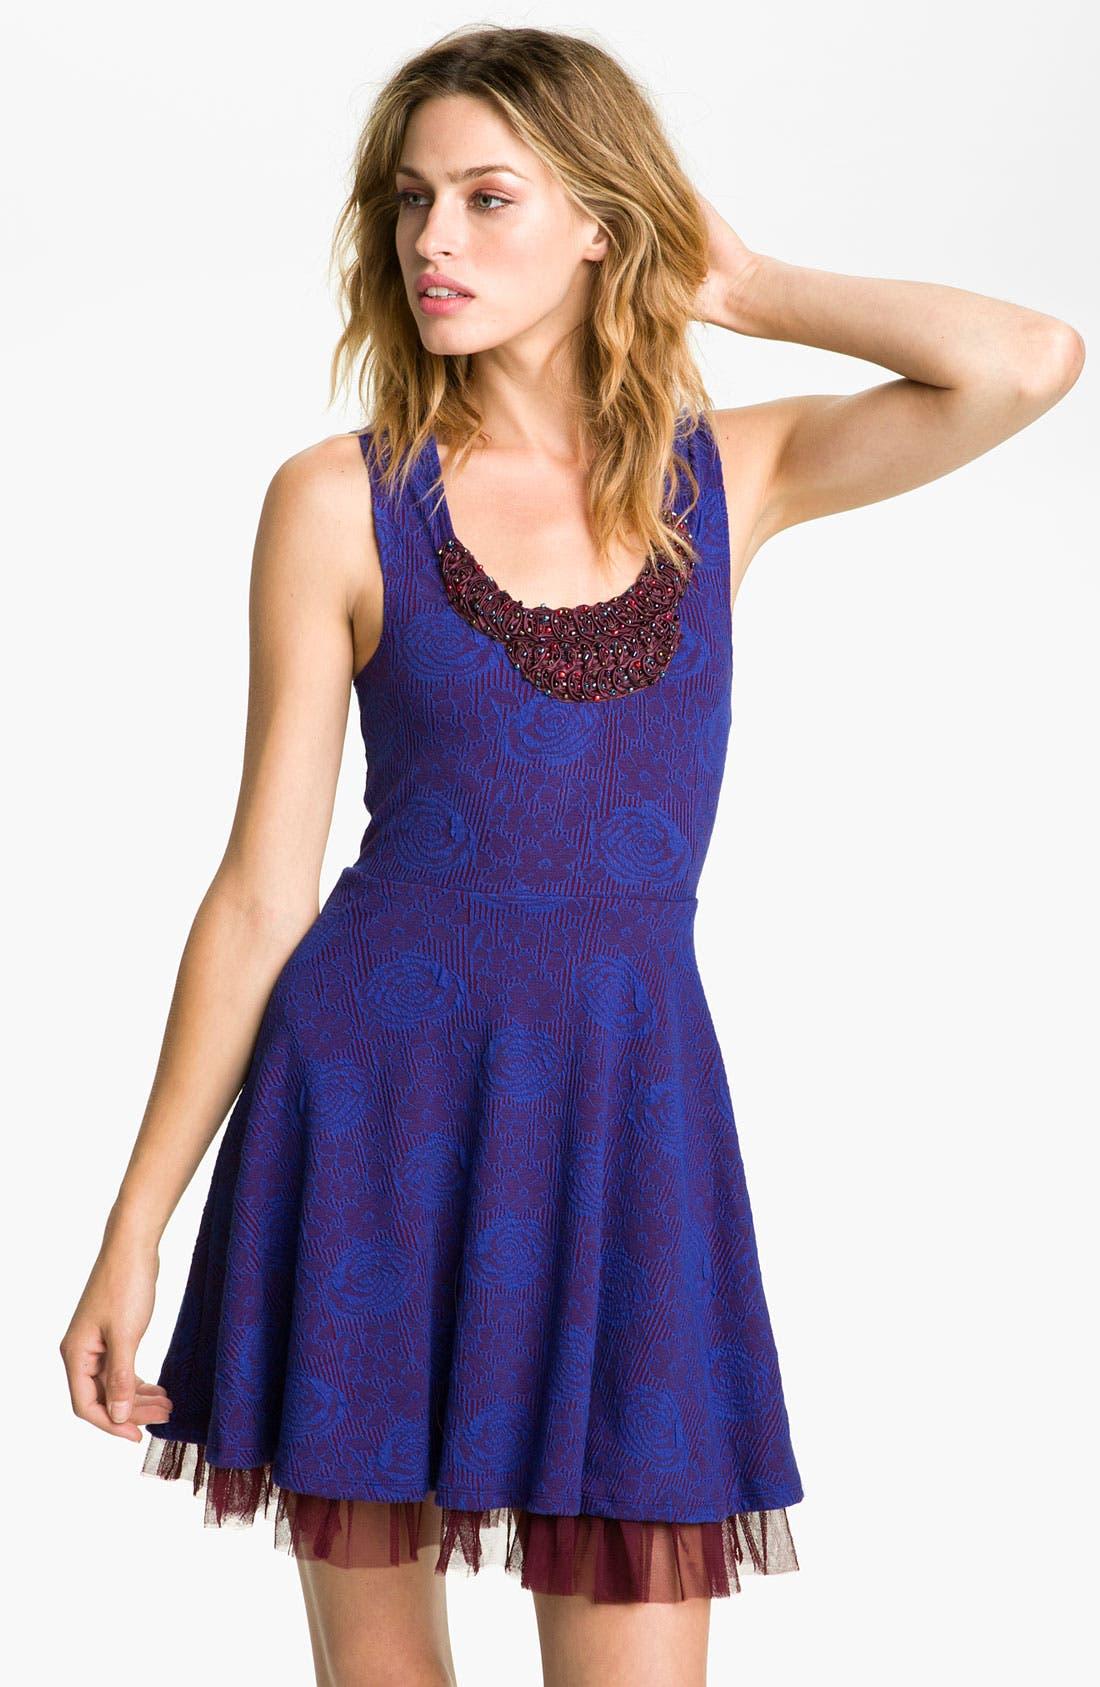 Alternate Image 1 Selected - Free People 'Rock Princess' Embellished Dress